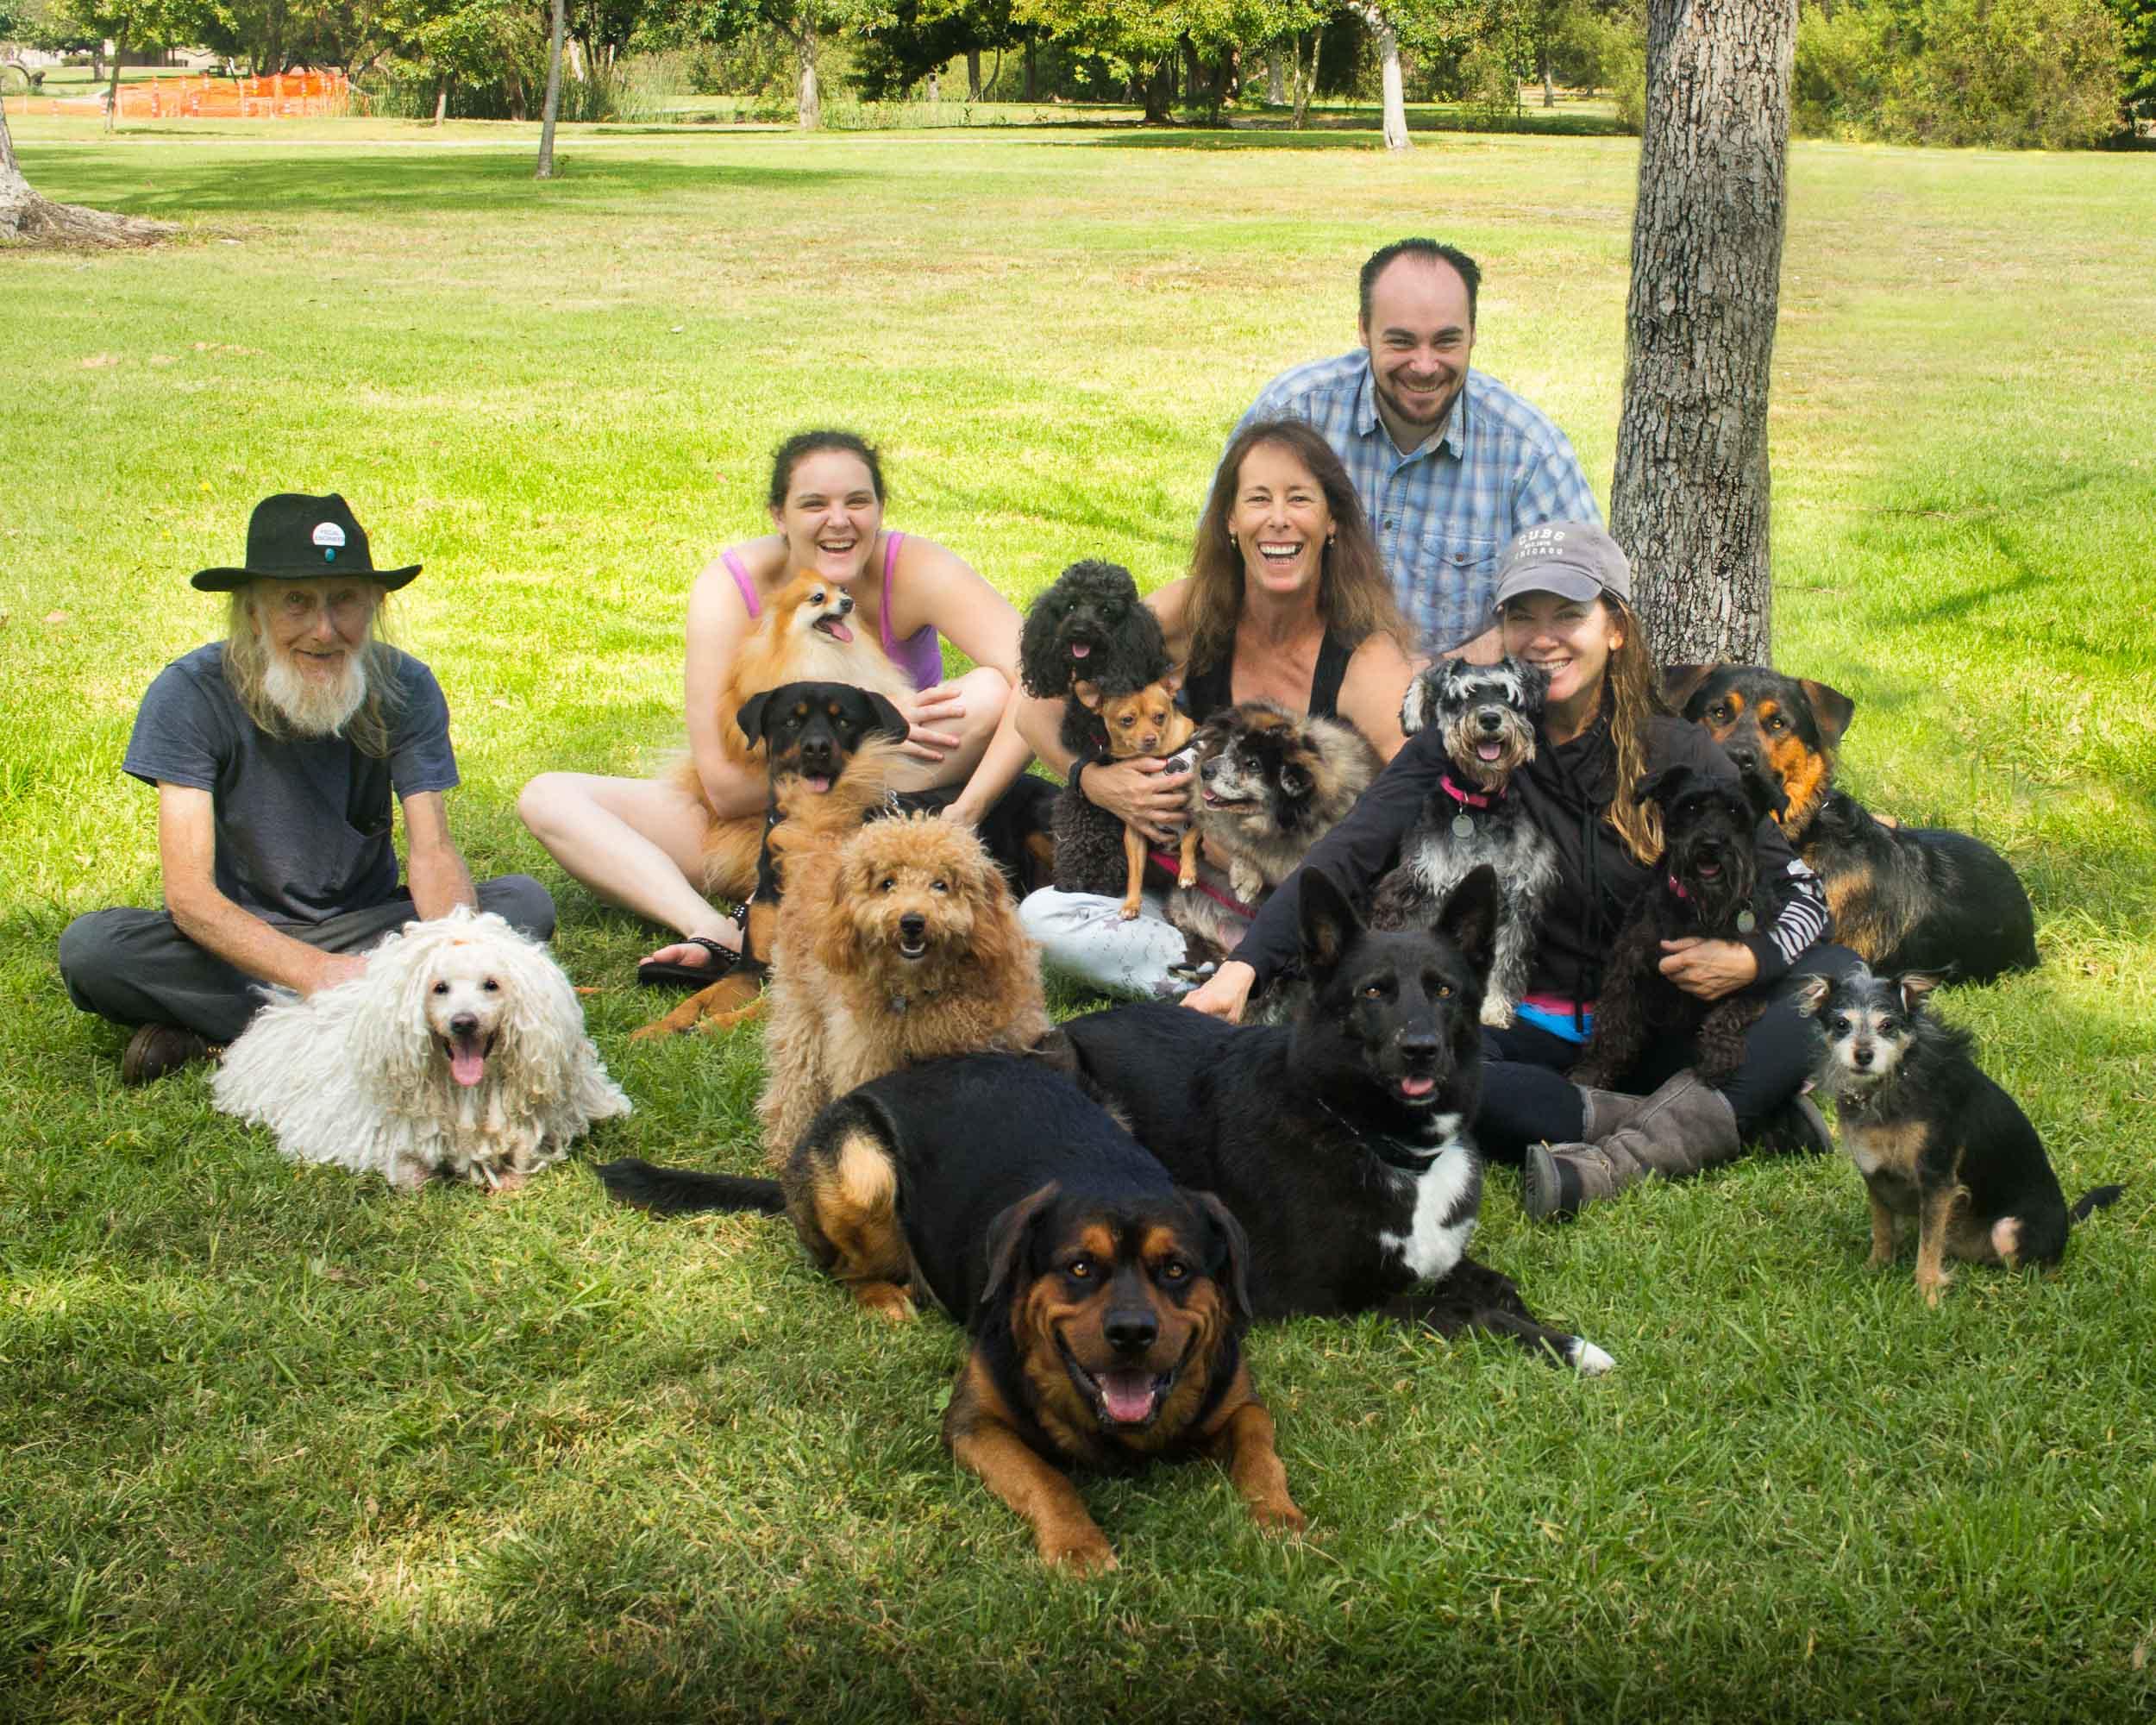 34-Orange-County-Dog-Photographer-Southern-California-Steamer-Lee.JPG